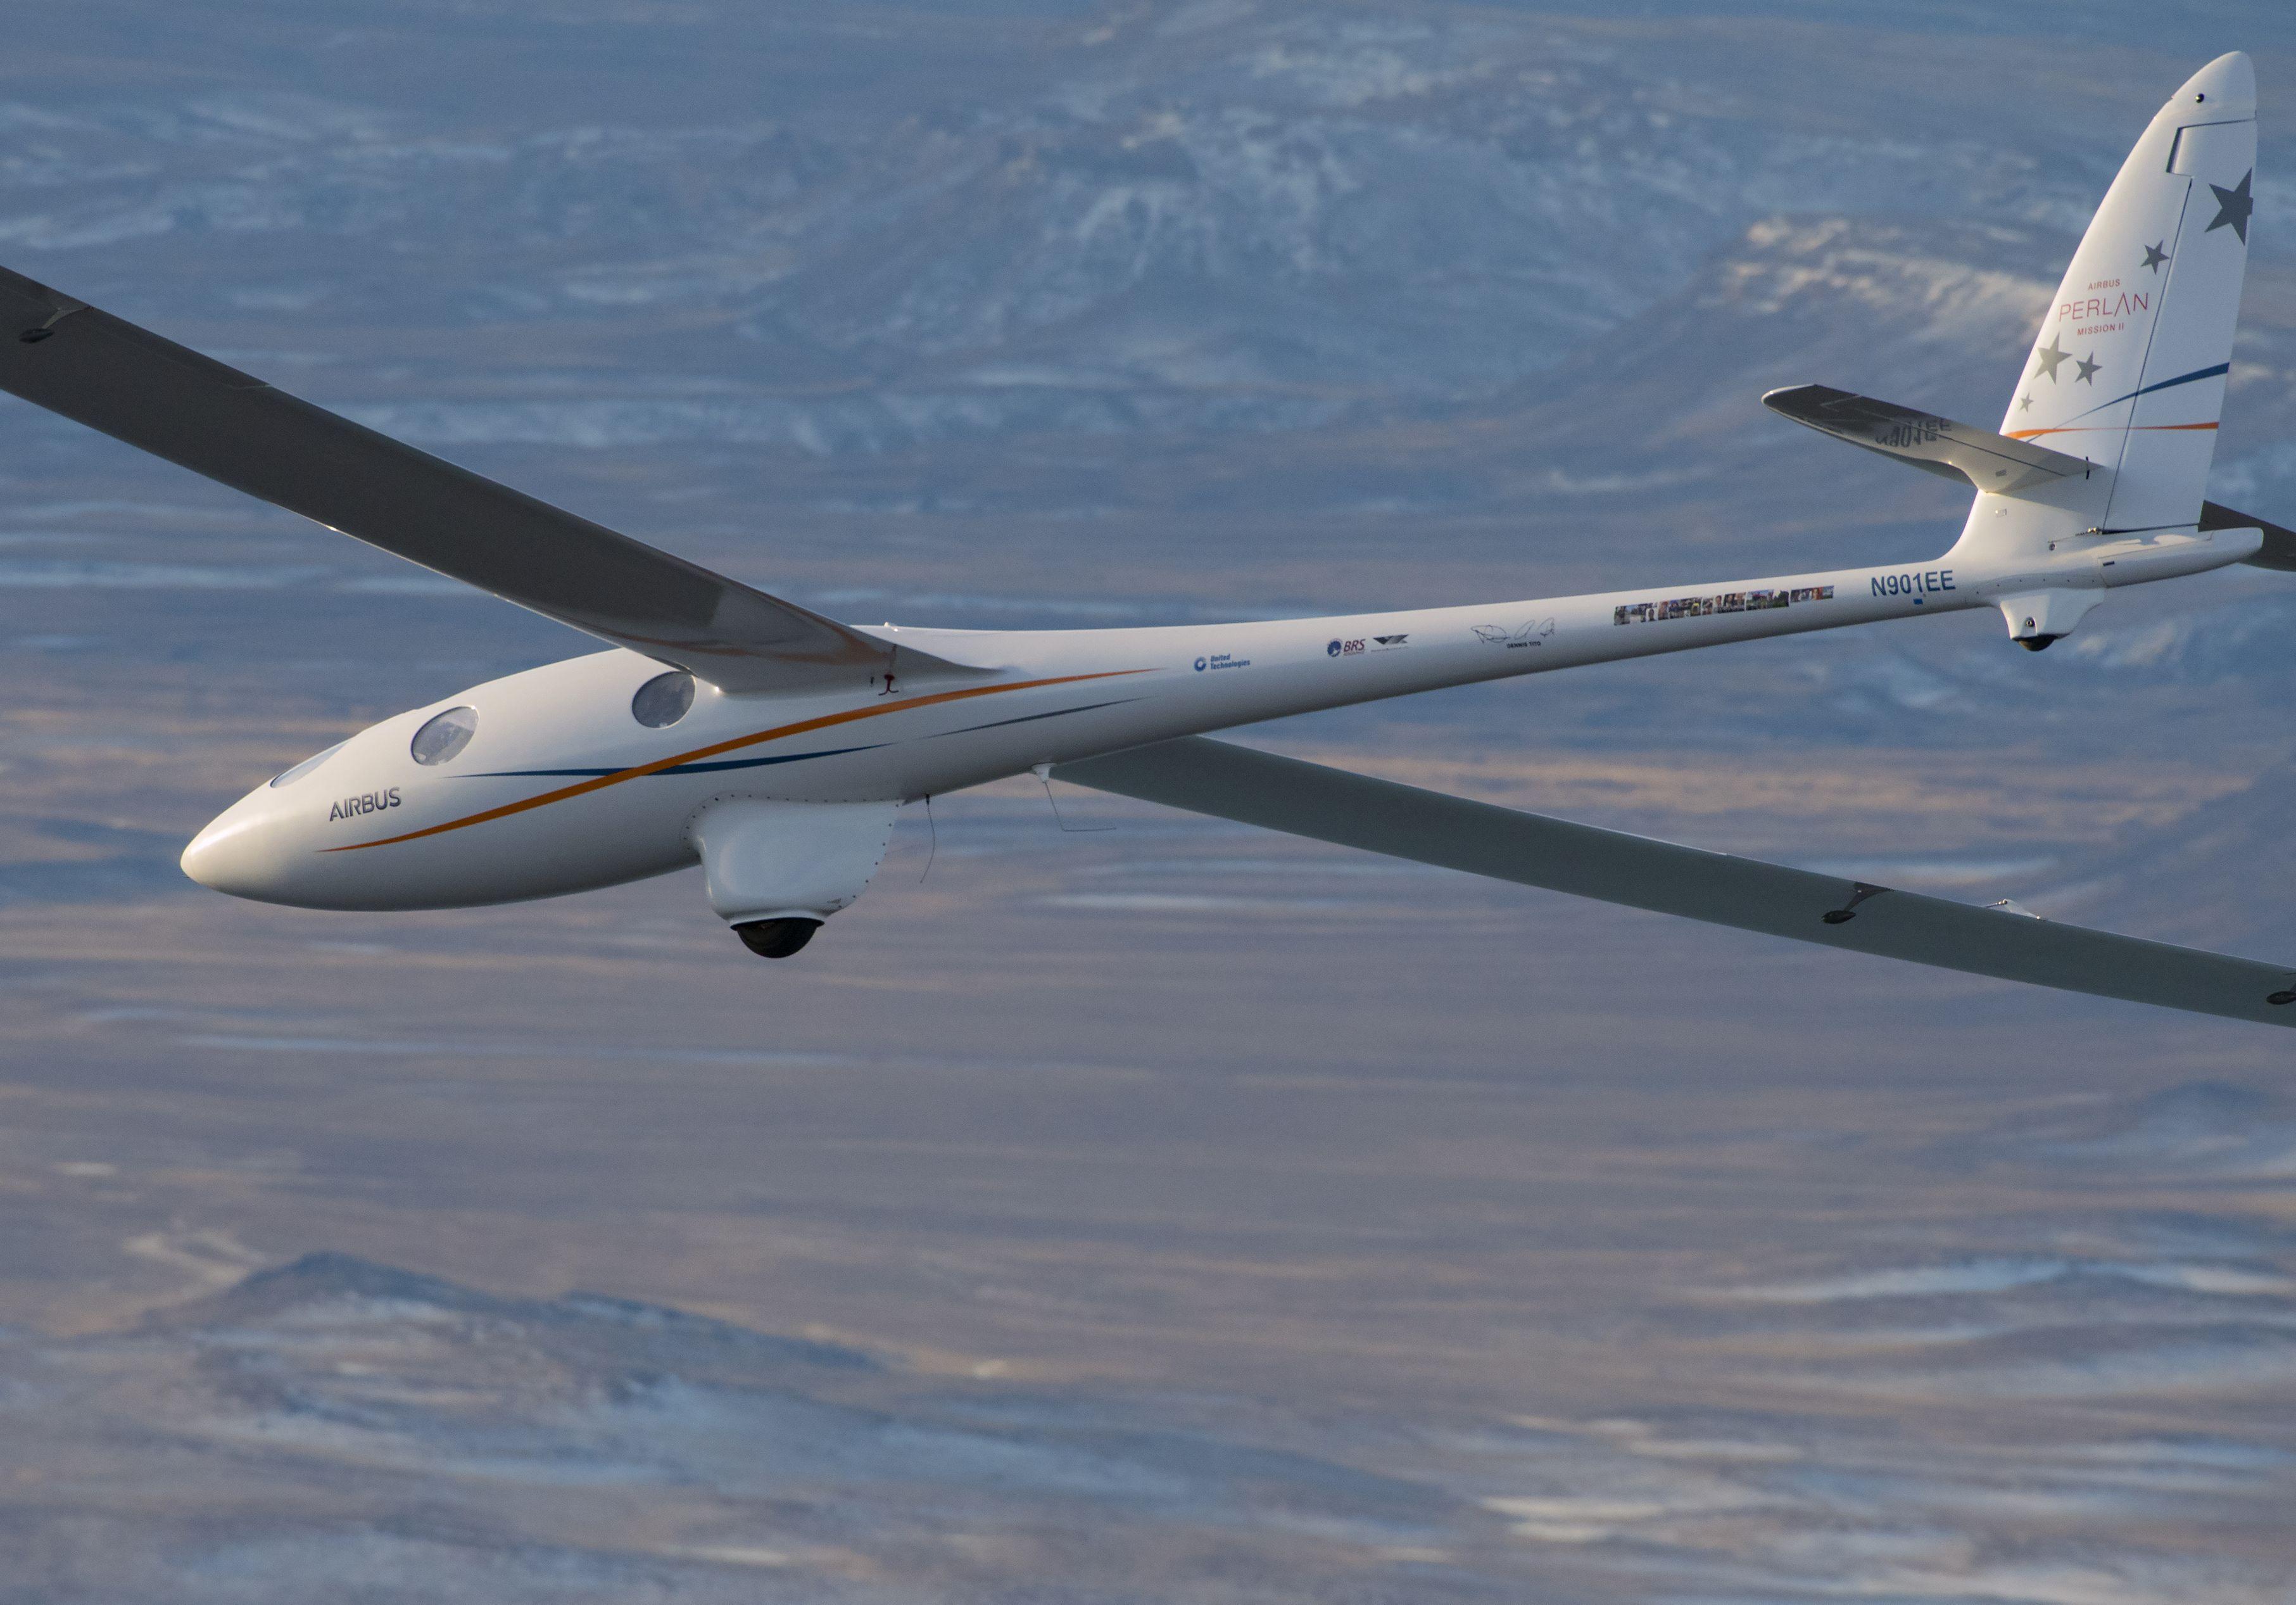 d809739654 Airbus rompe récord de altura con avión planeador